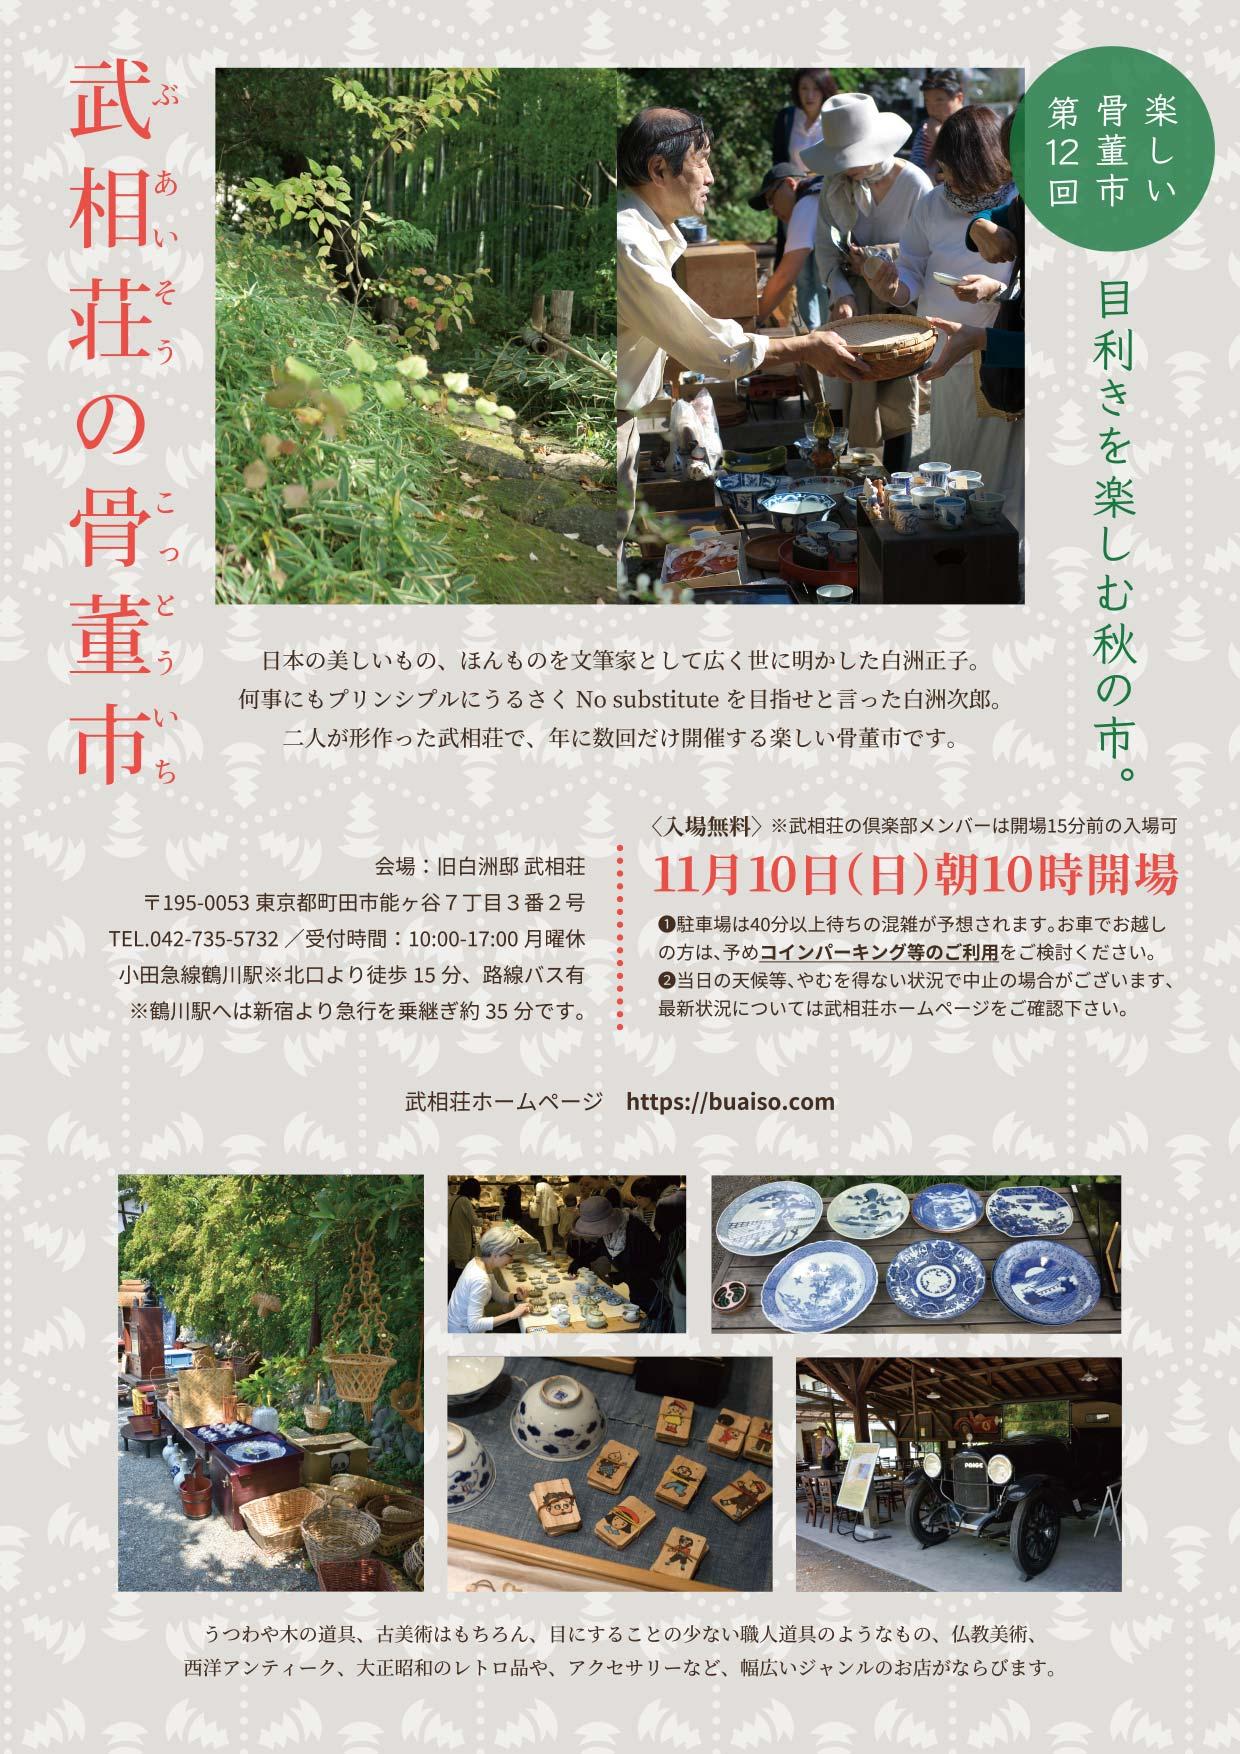 武相荘の骨董市 2019年11月10日(日)